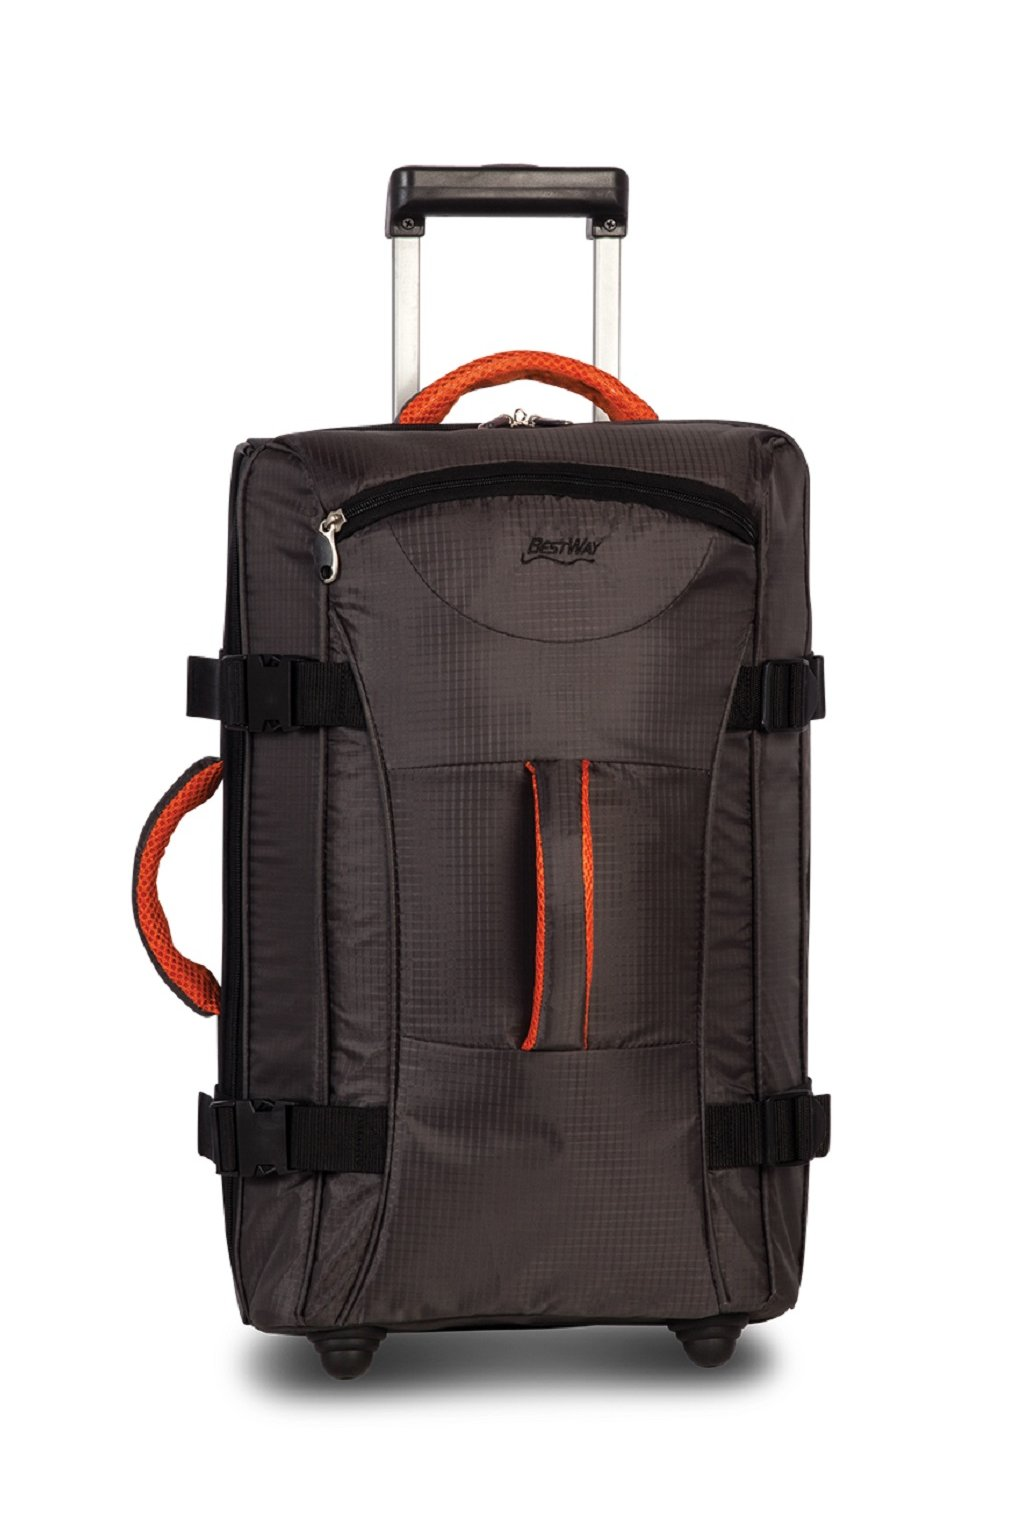 kufrland bestway taškanakolečkách grey2